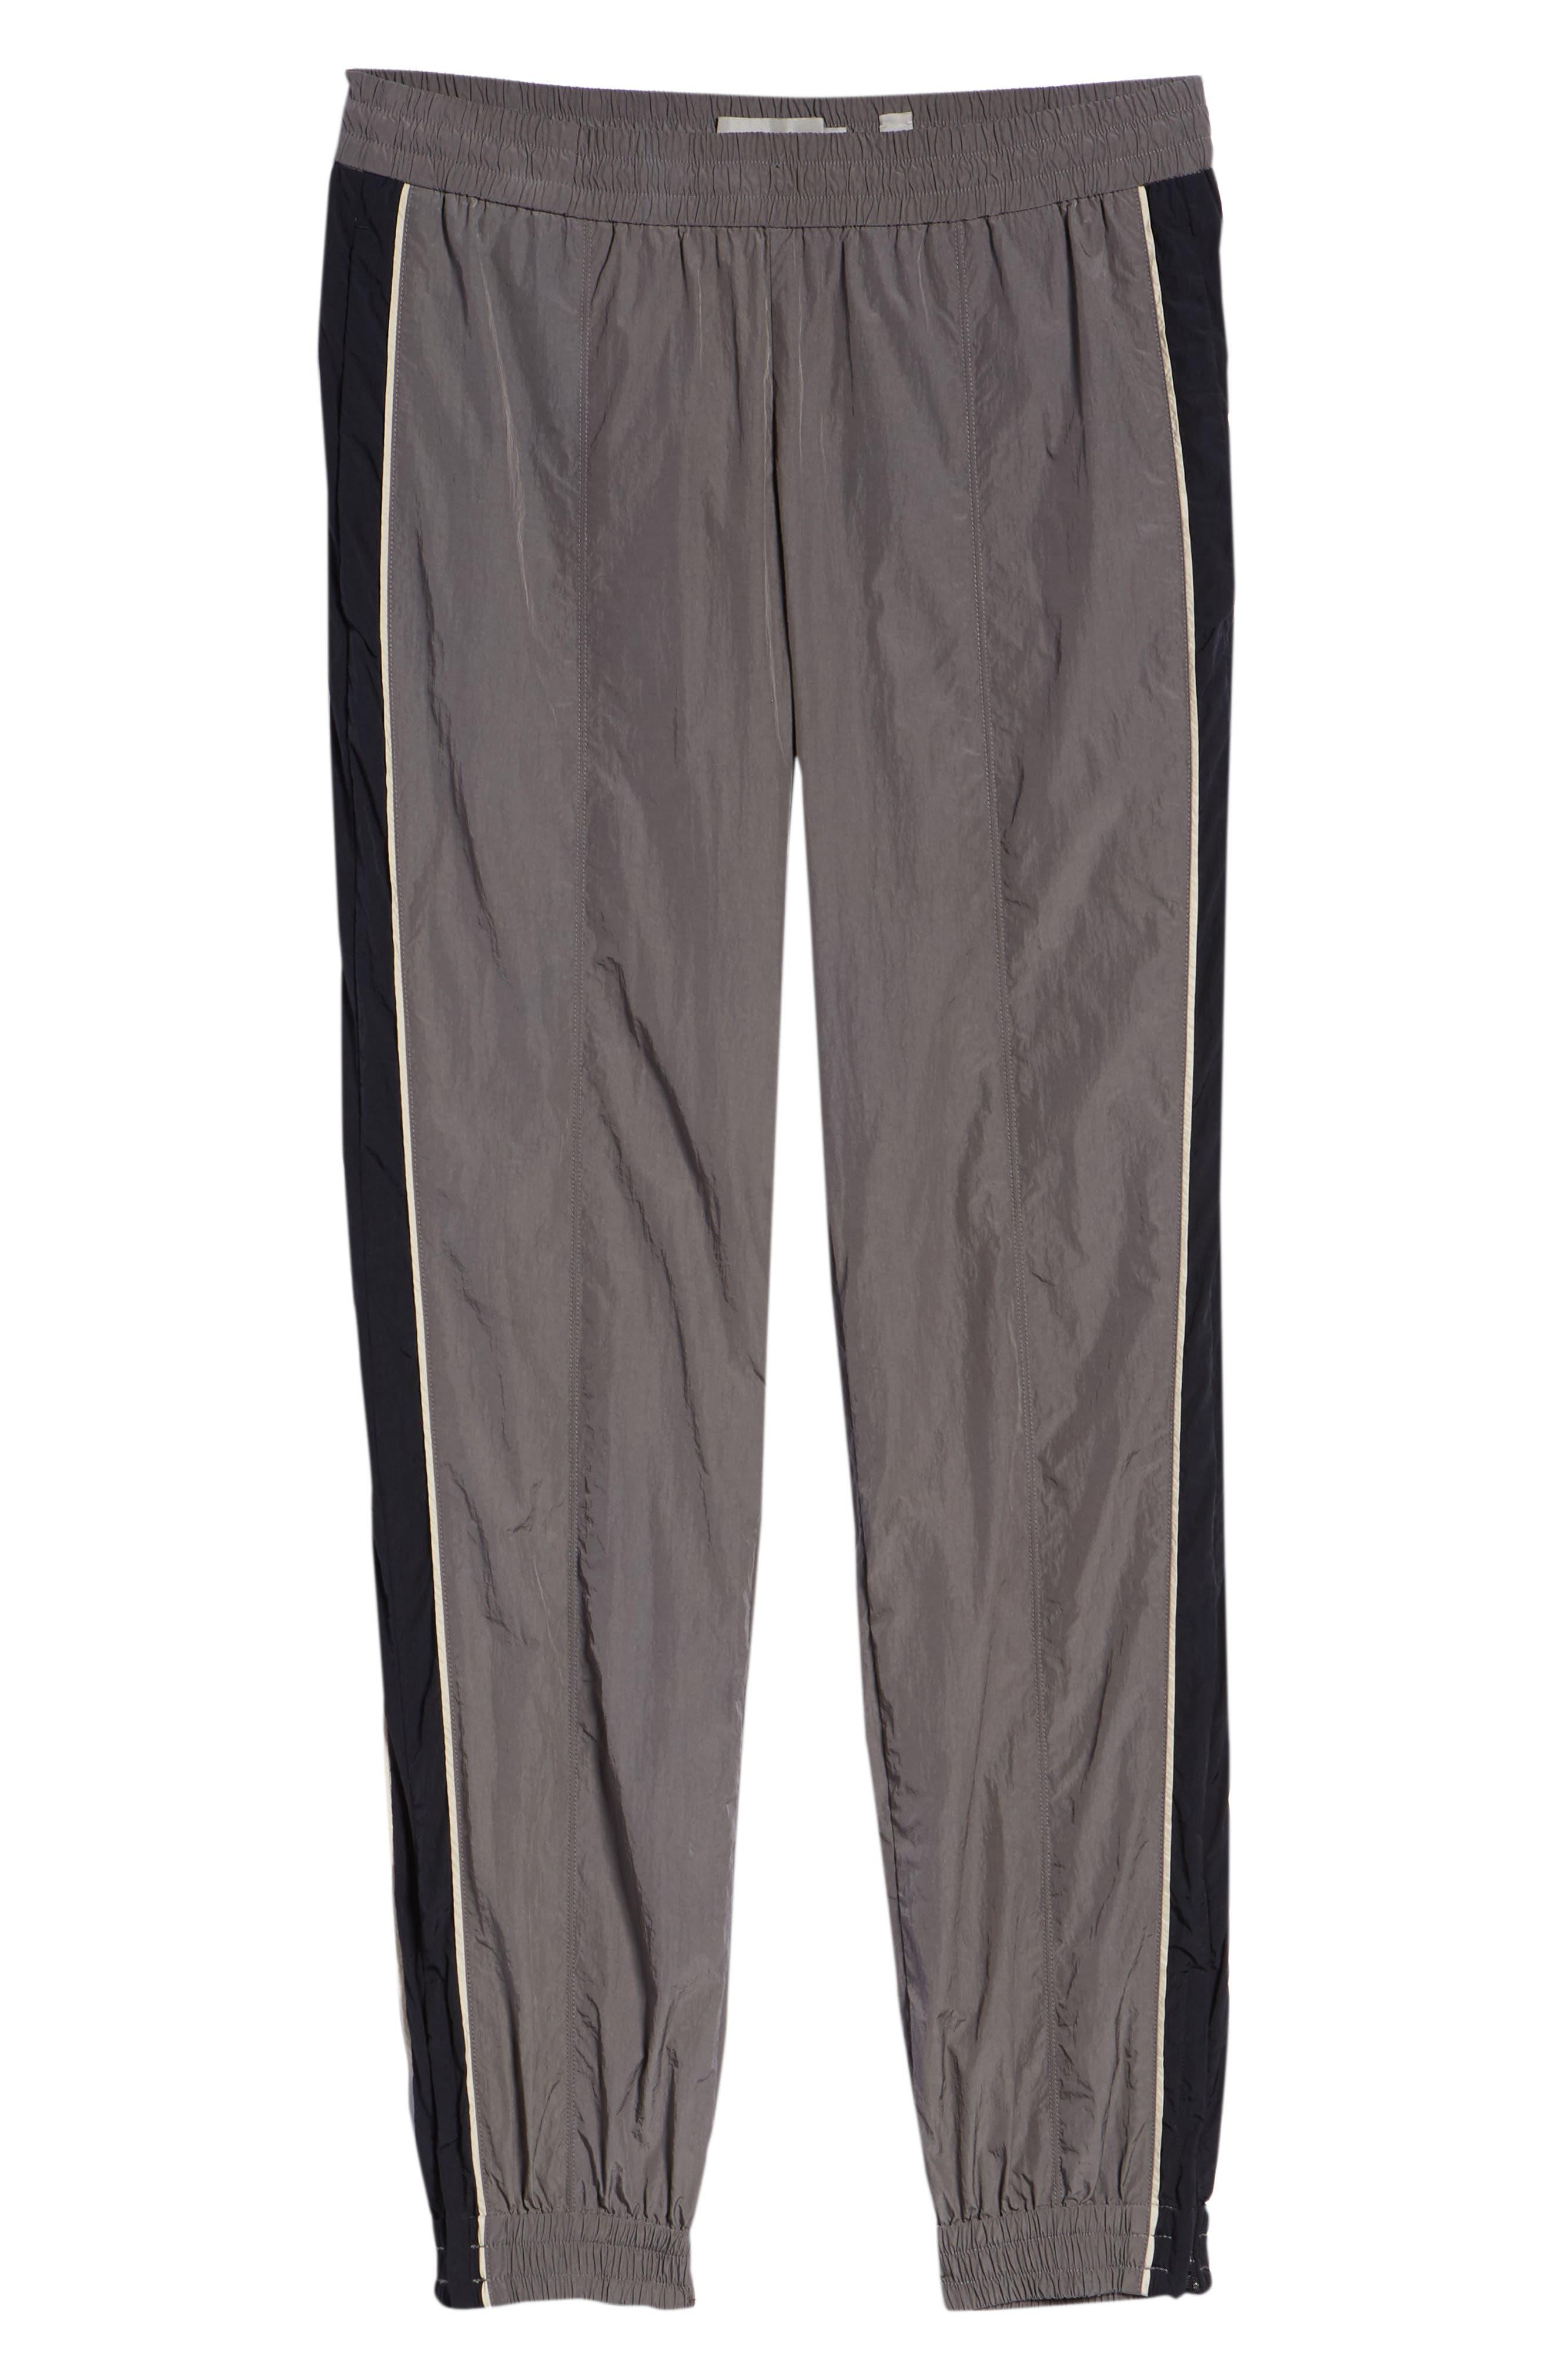 Track Pants,                             Alternate thumbnail 6, color,                             Granite